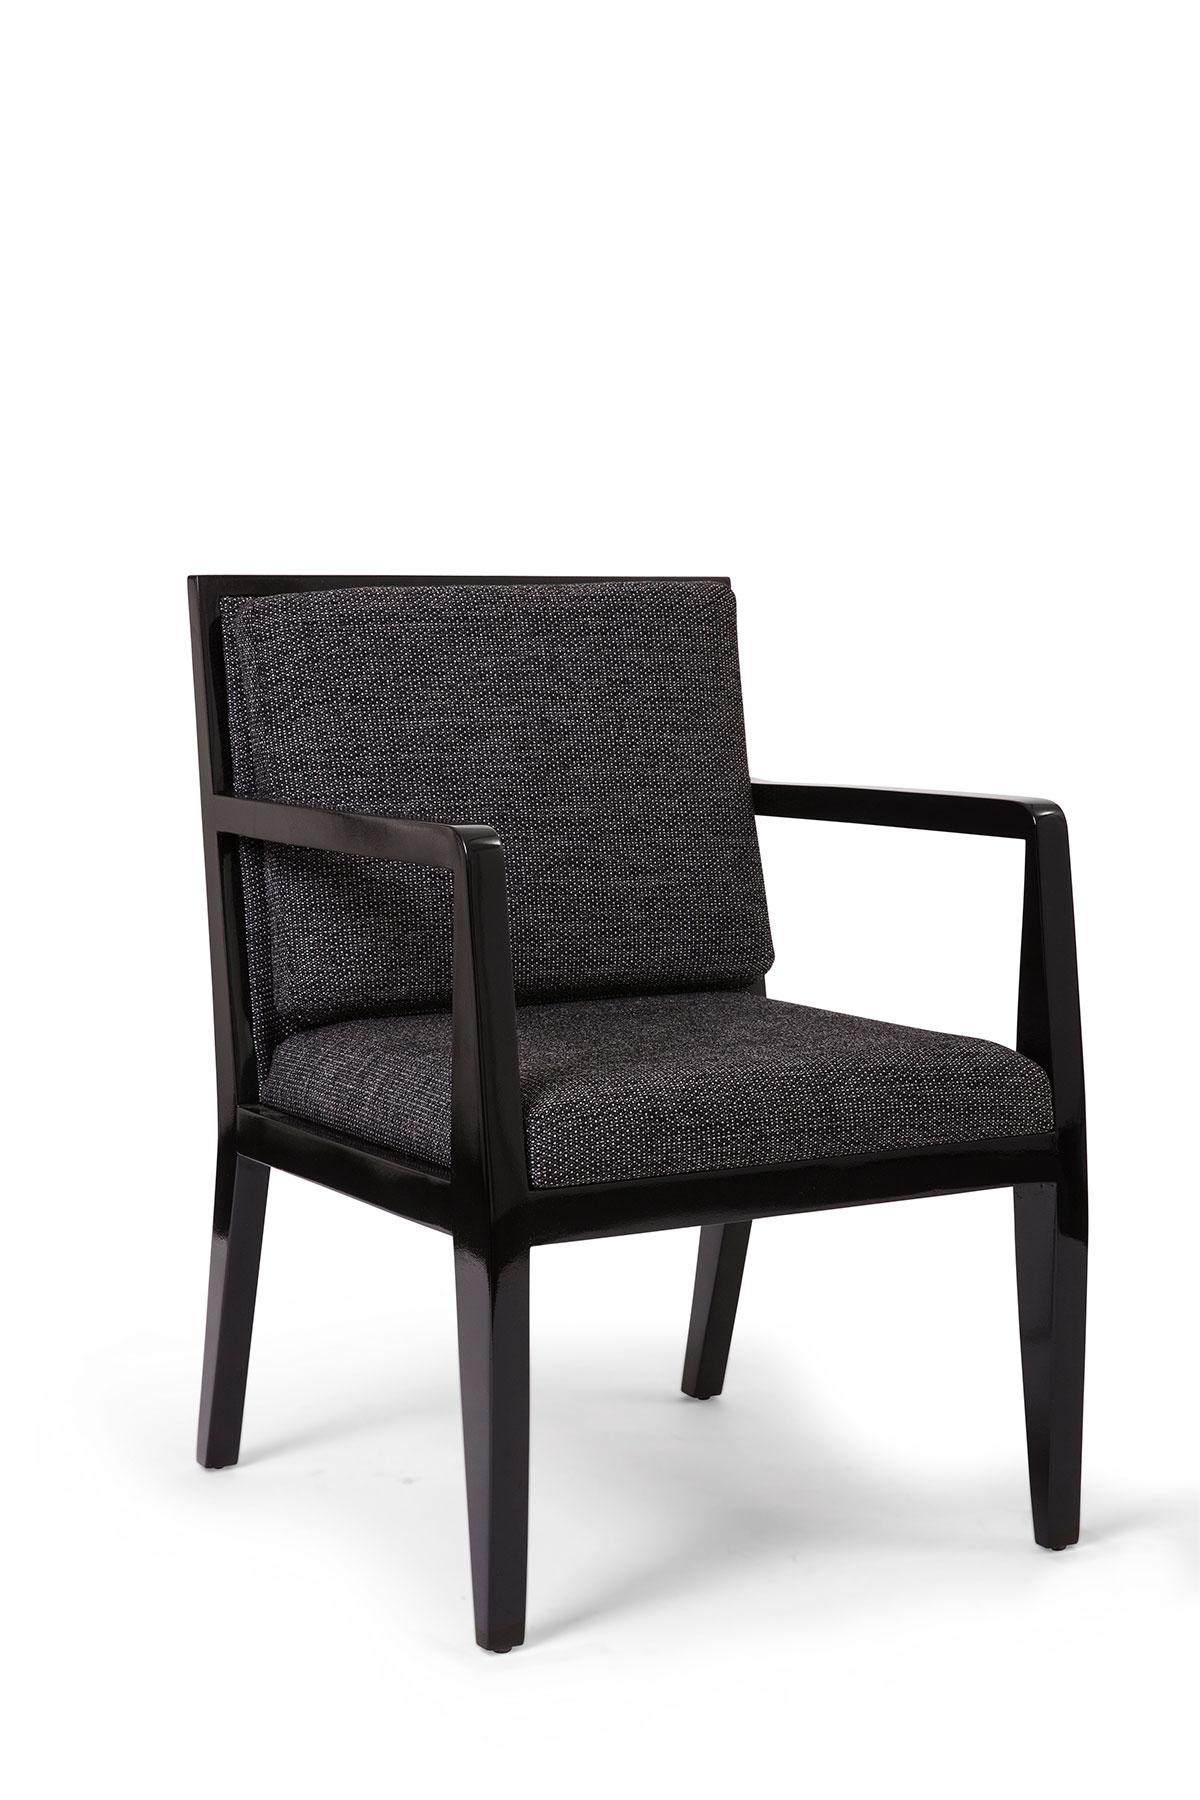 Msizi Dining Chair